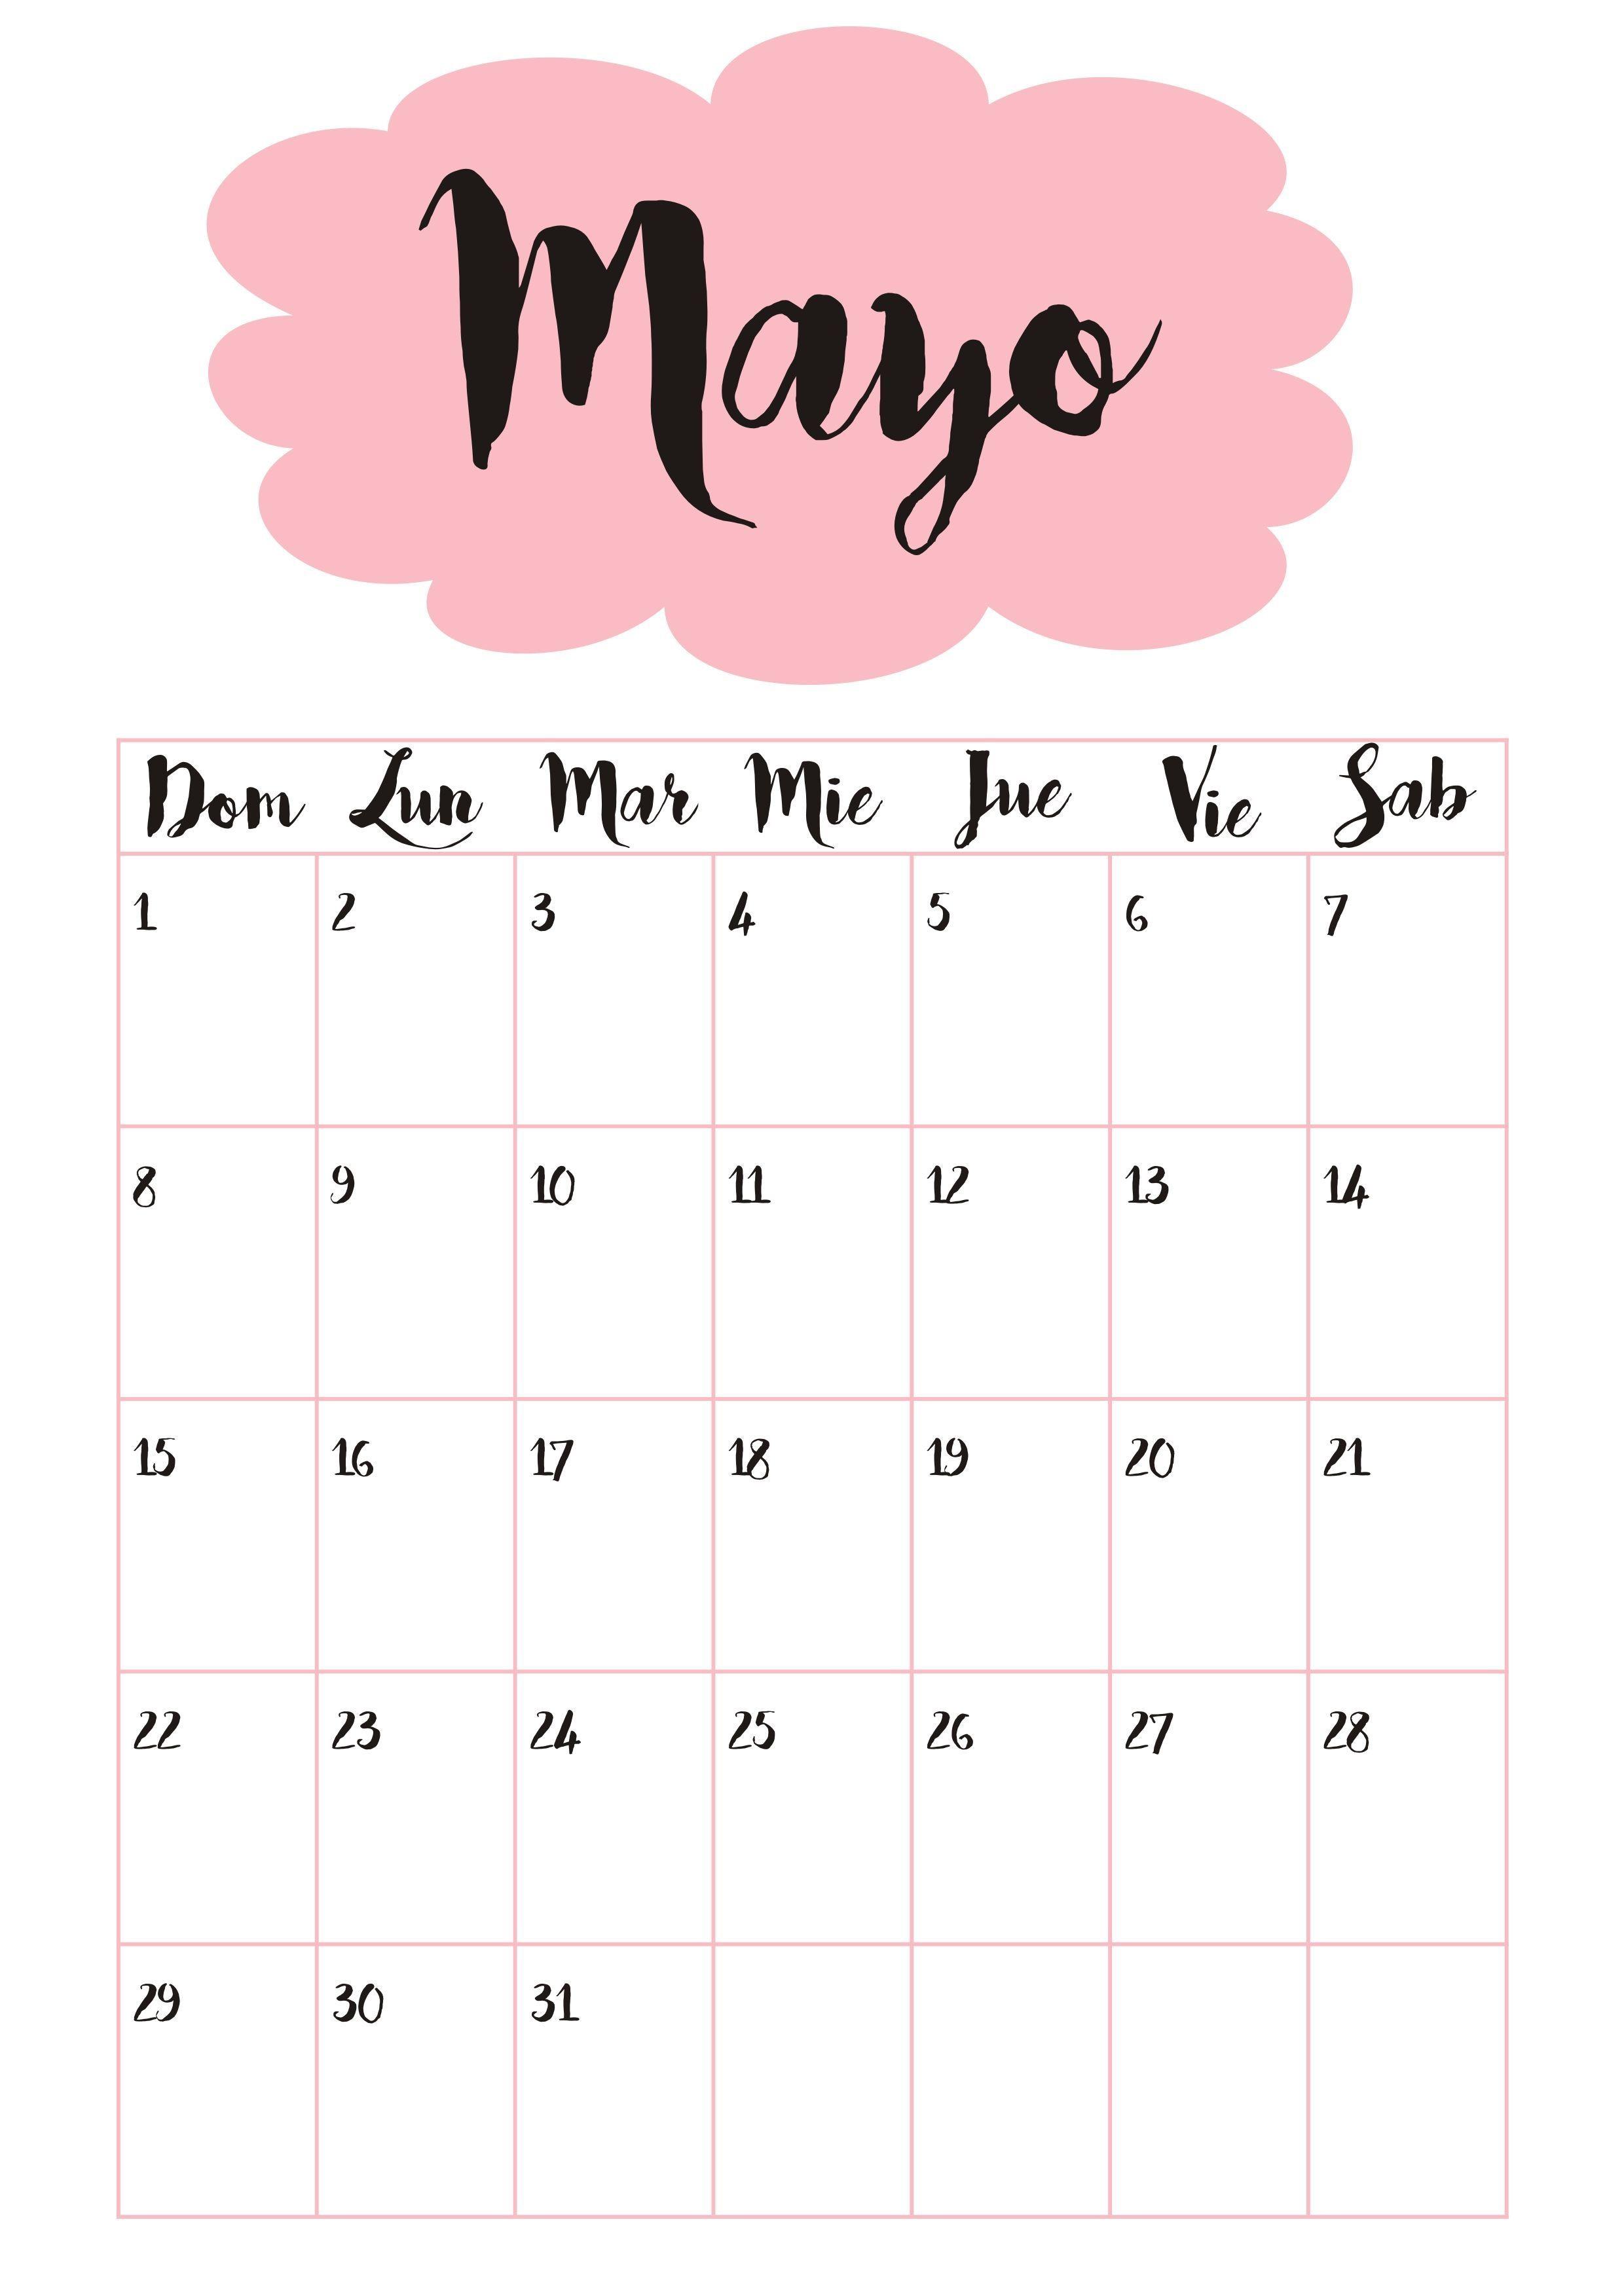 Calendario Semanal Abril 2019 Para Imprimir Recientes Calendario 5 Mayo ☼ Ejersisios Pinterest